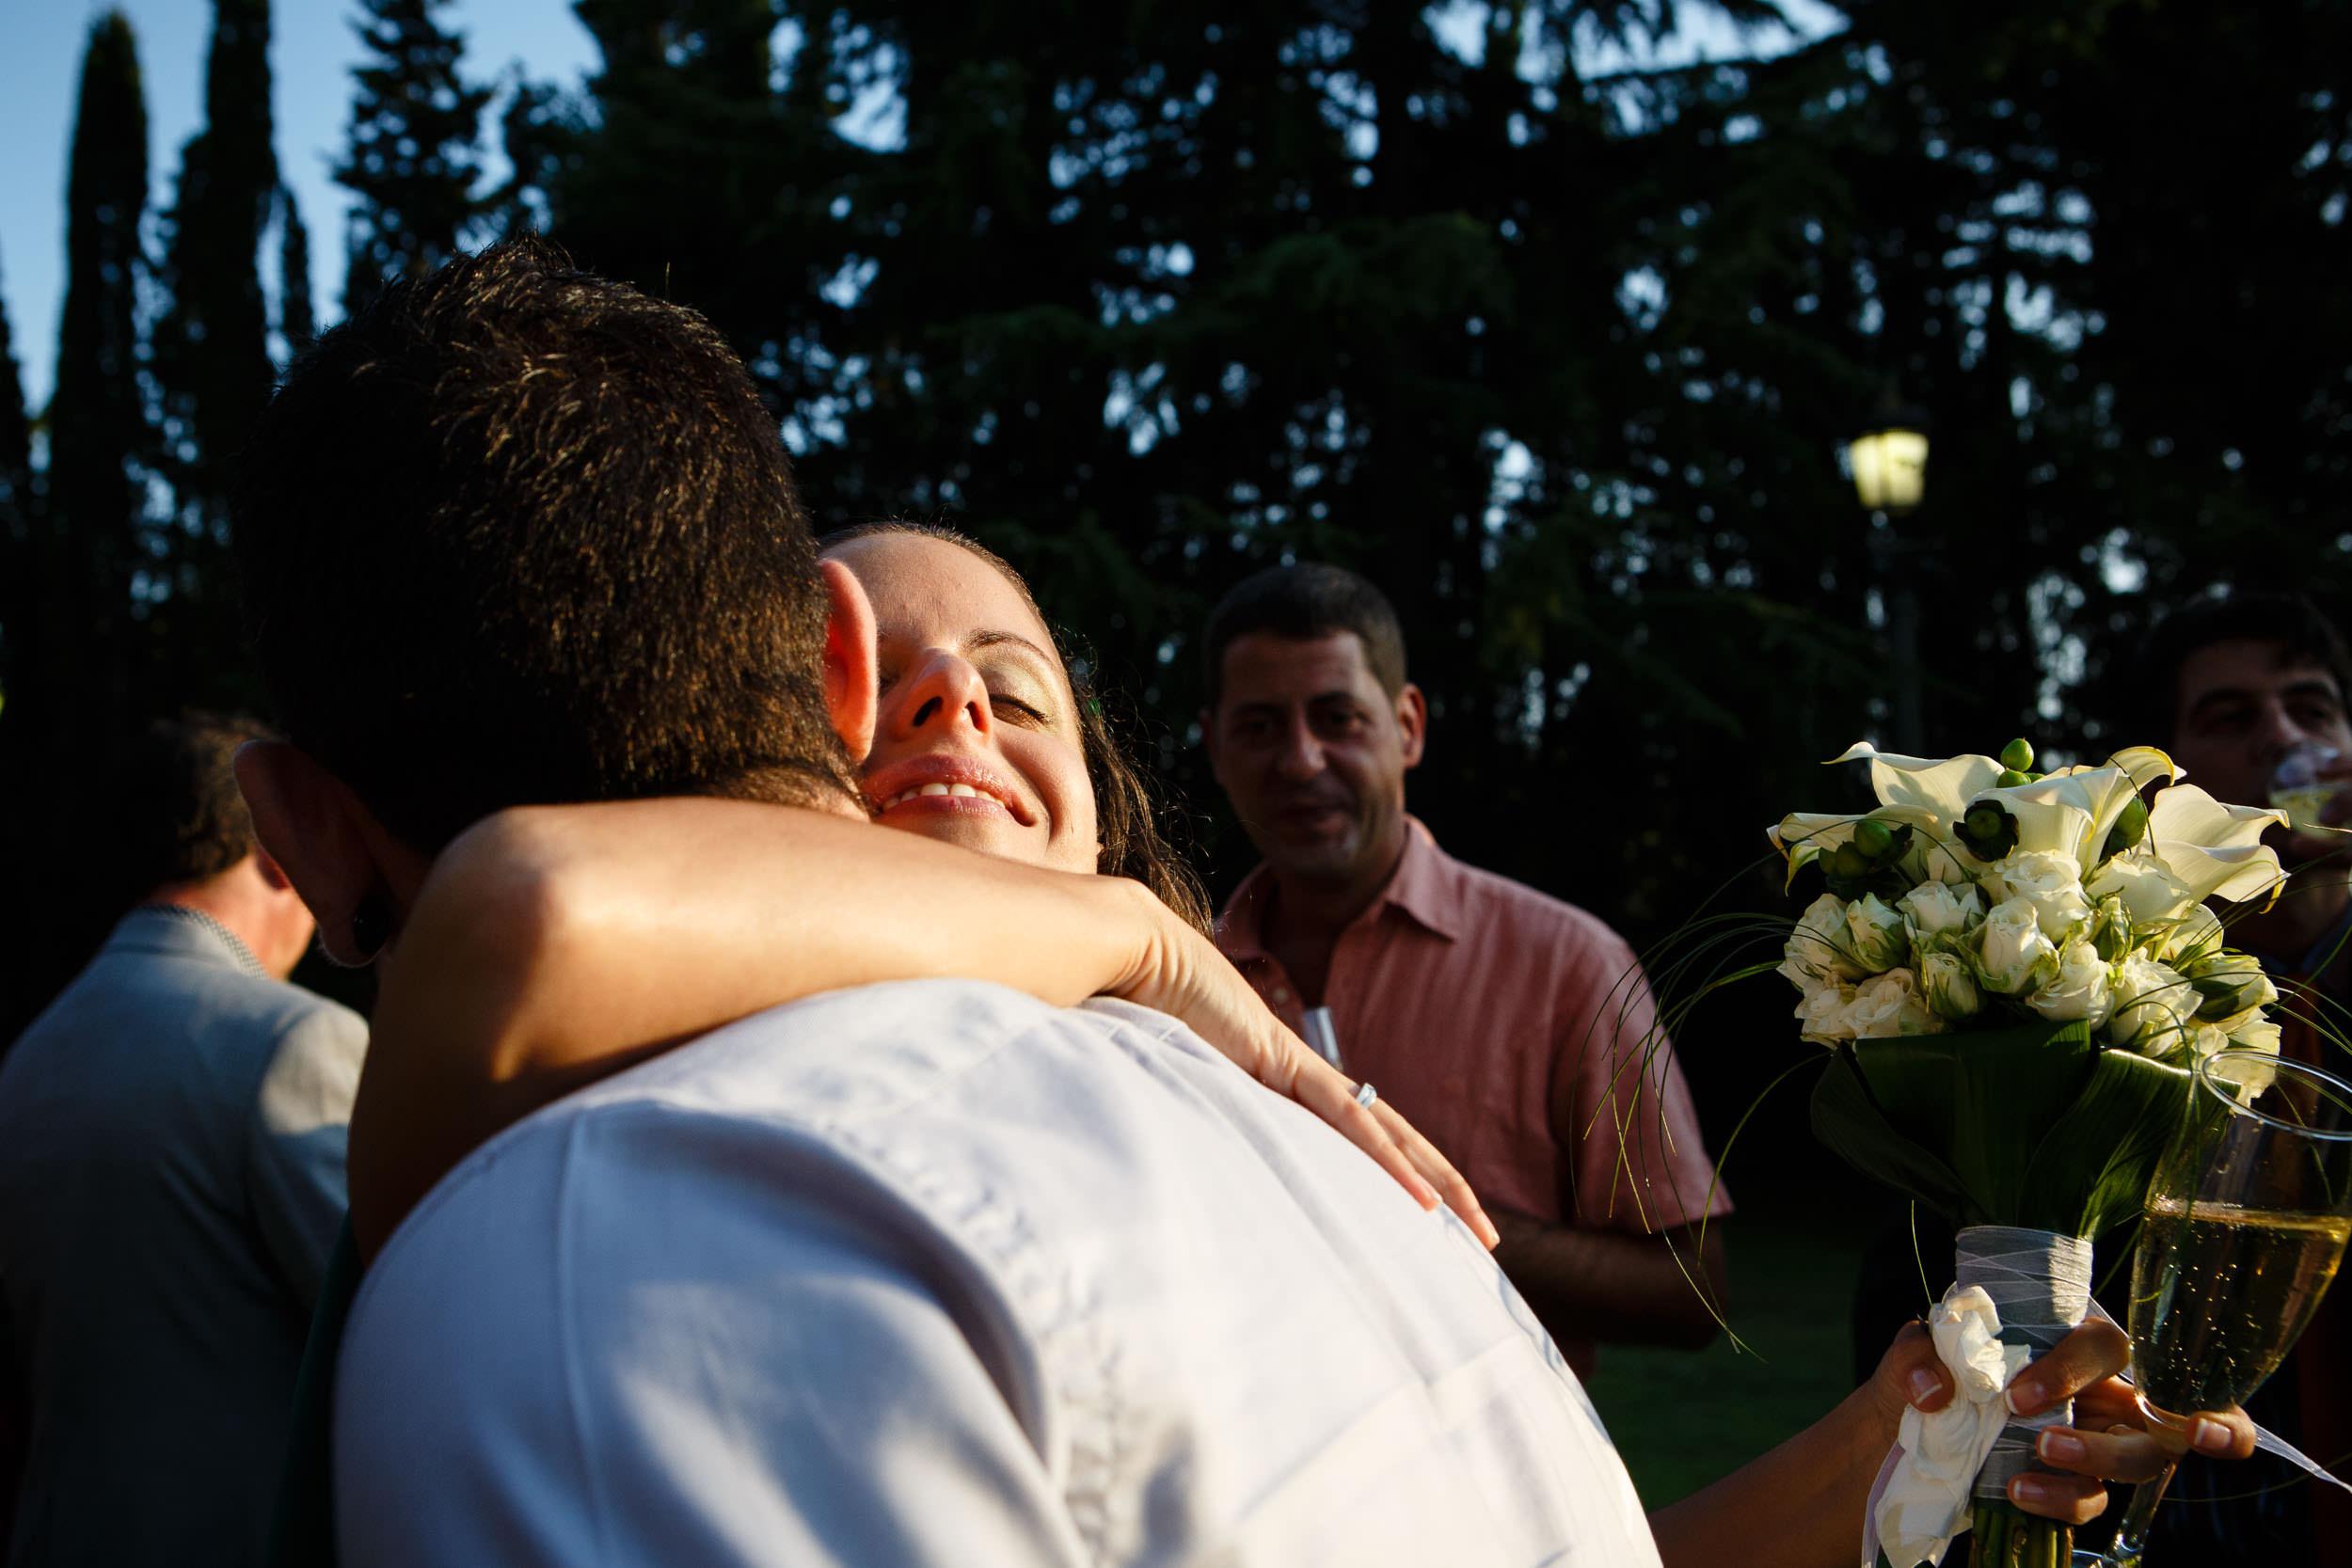 Destination Wedding   Vil.la Sabat Sant Cugat del Valles Barcelona Catalonia Spain - James Sturcke  Photographer   sturcke.org_006.jpg